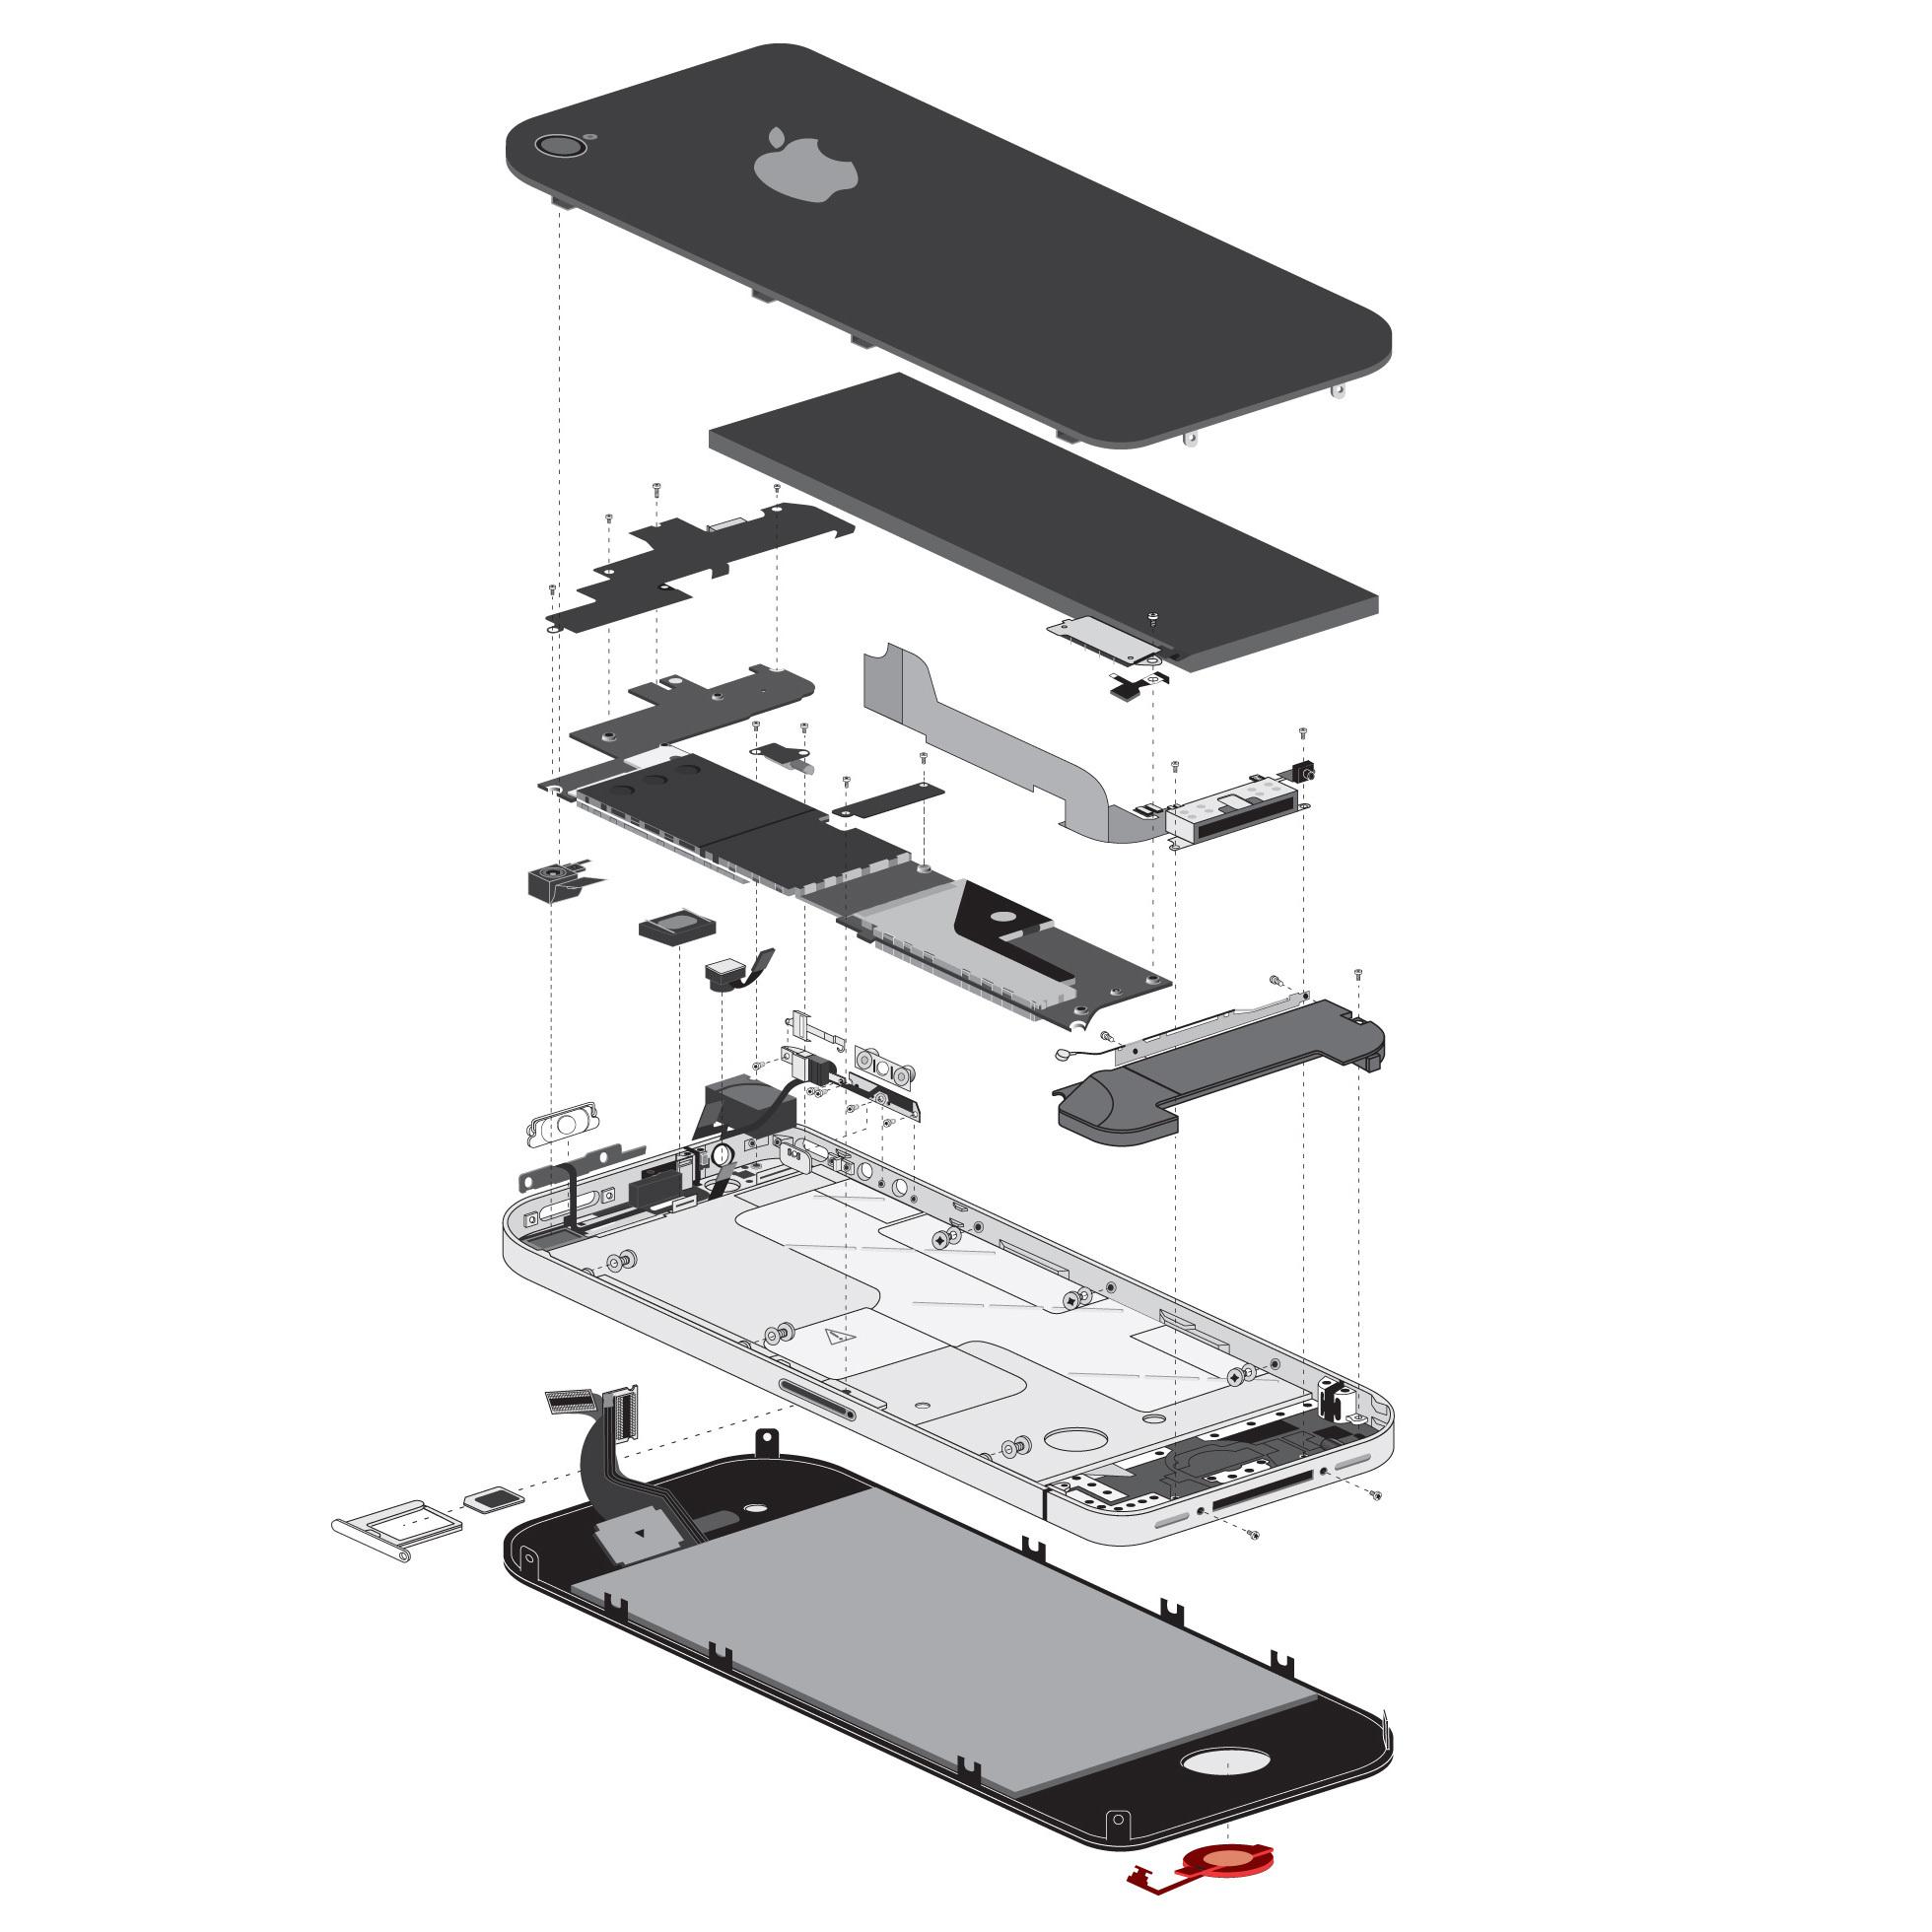 back of iphone 4s diagram 1998 vw golf radio wiring screen repair in kingston ontario | repair, parts & service